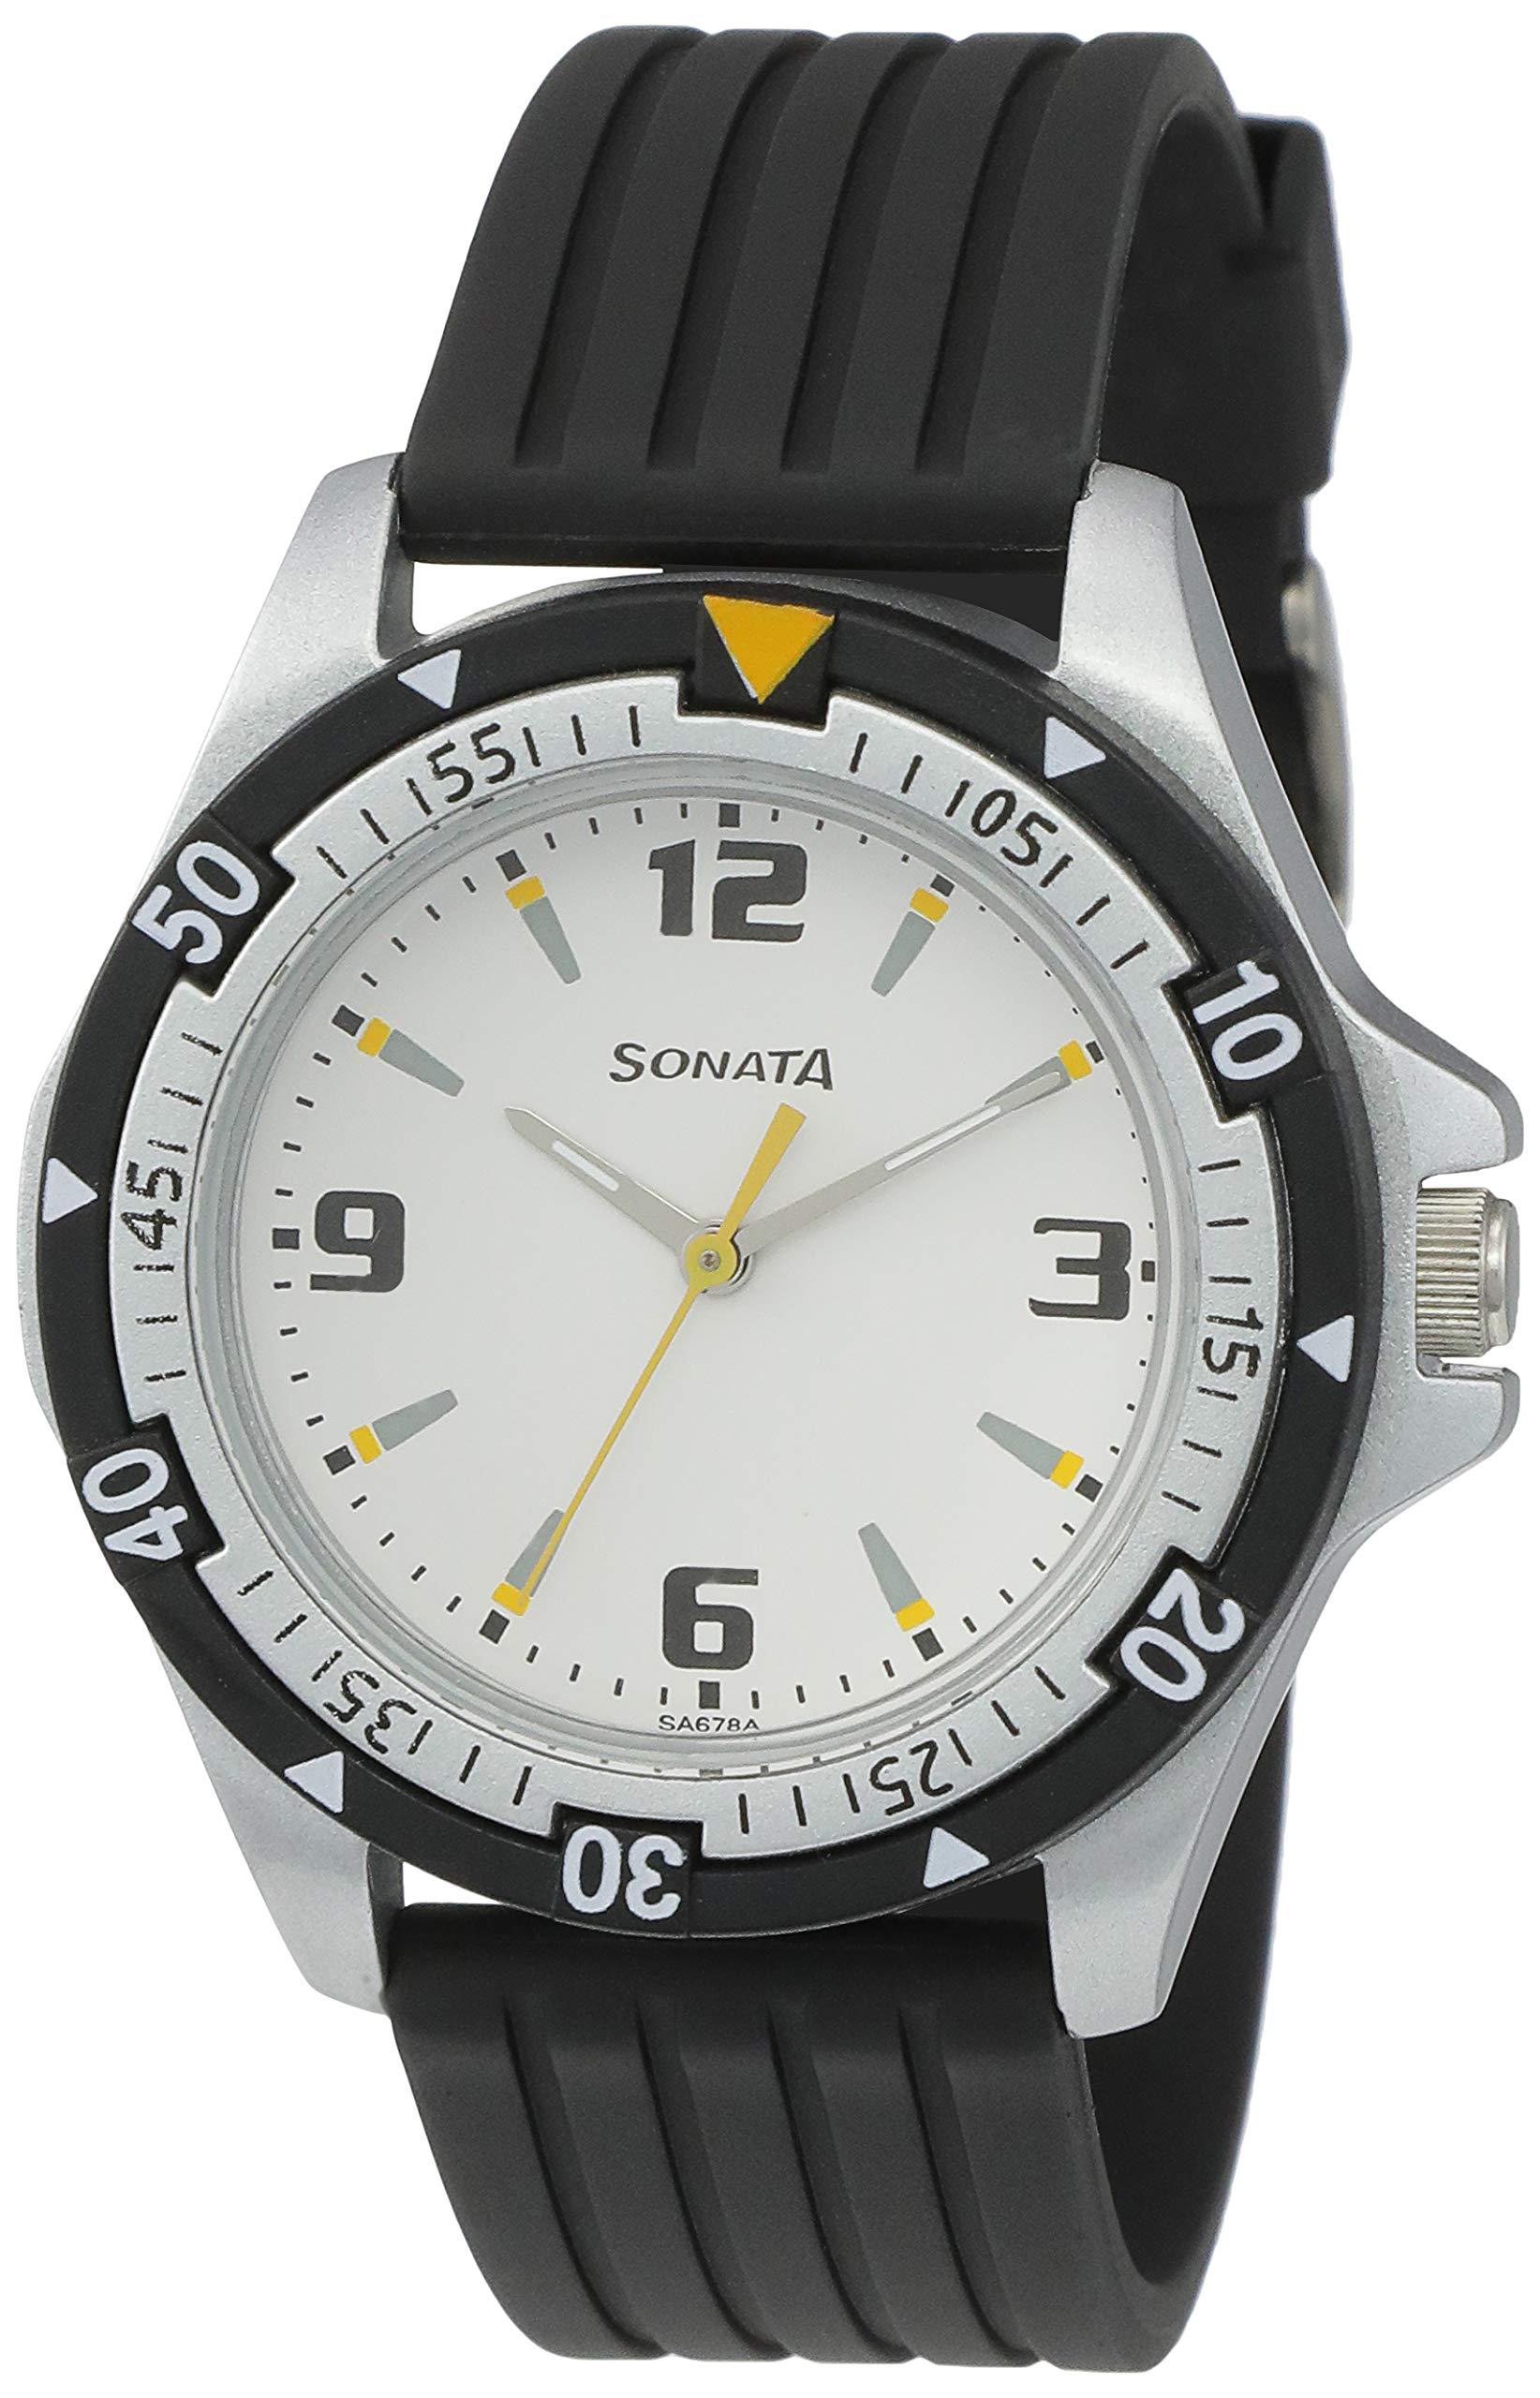 Sonata Super Fibre Analog Black Small Dial Men's Watch -NL7930PP01 product image